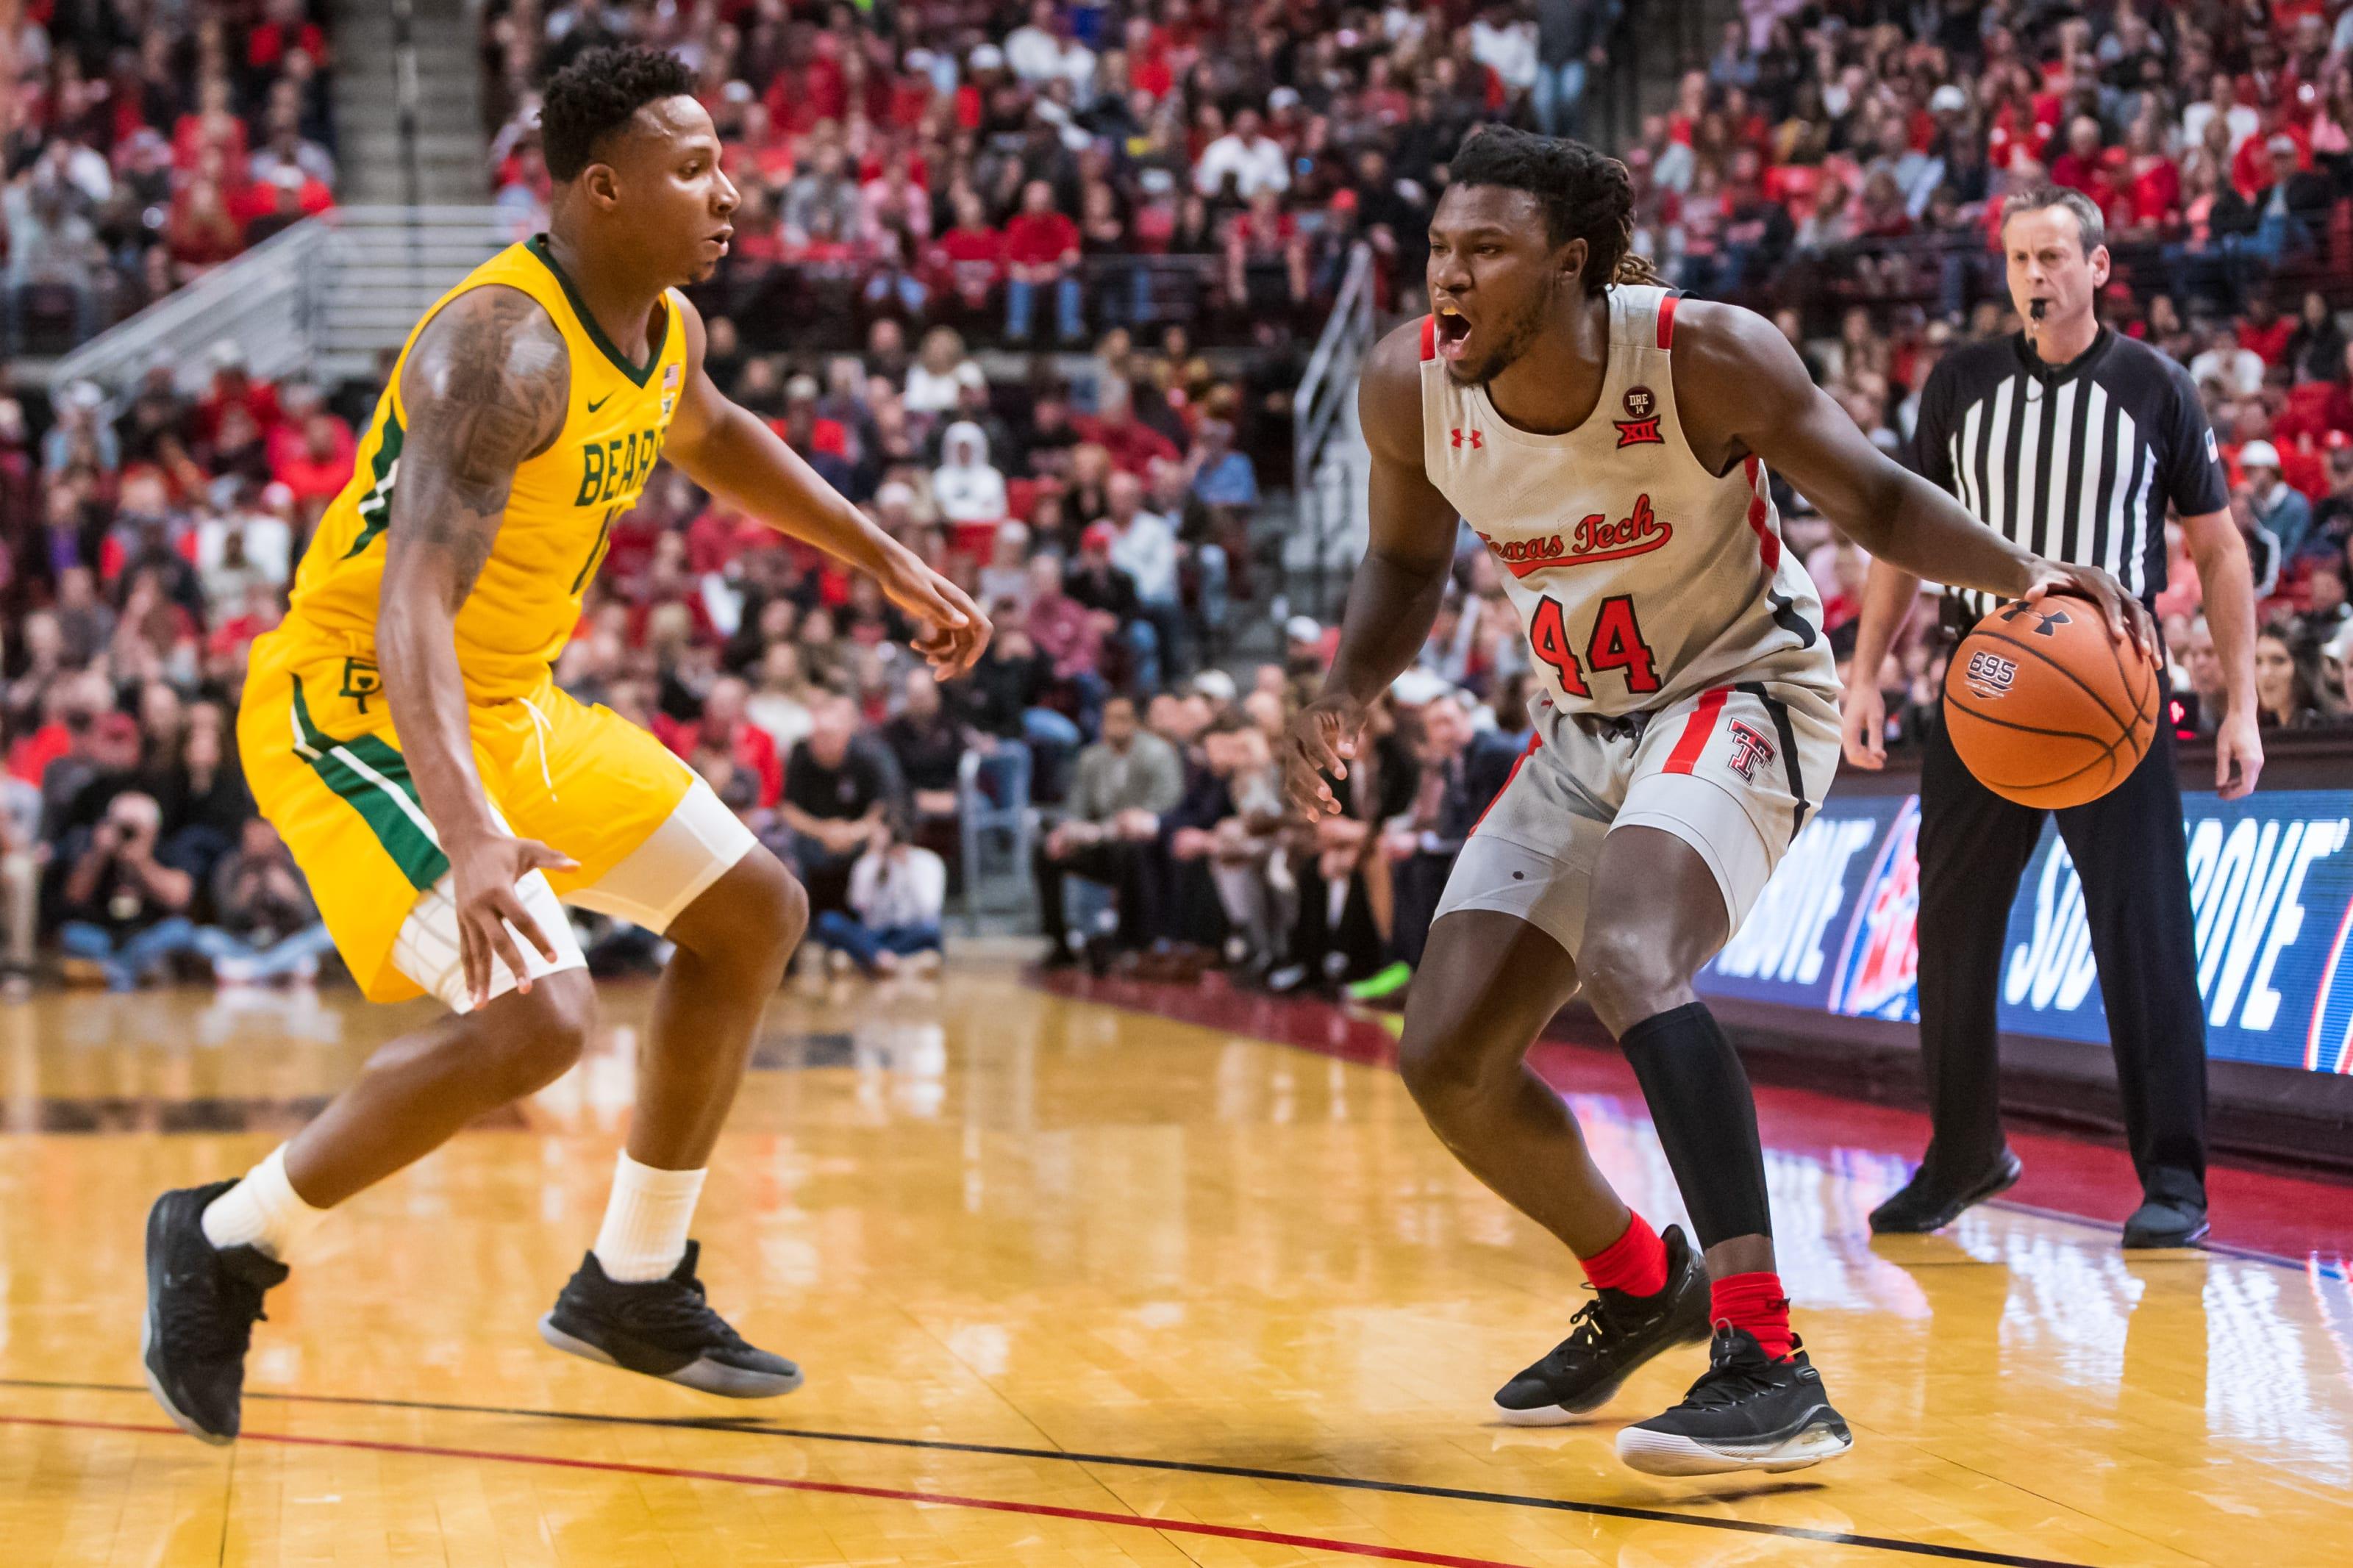 Texas Tech Basketball An Optimistic Look At The Loss To Baylor